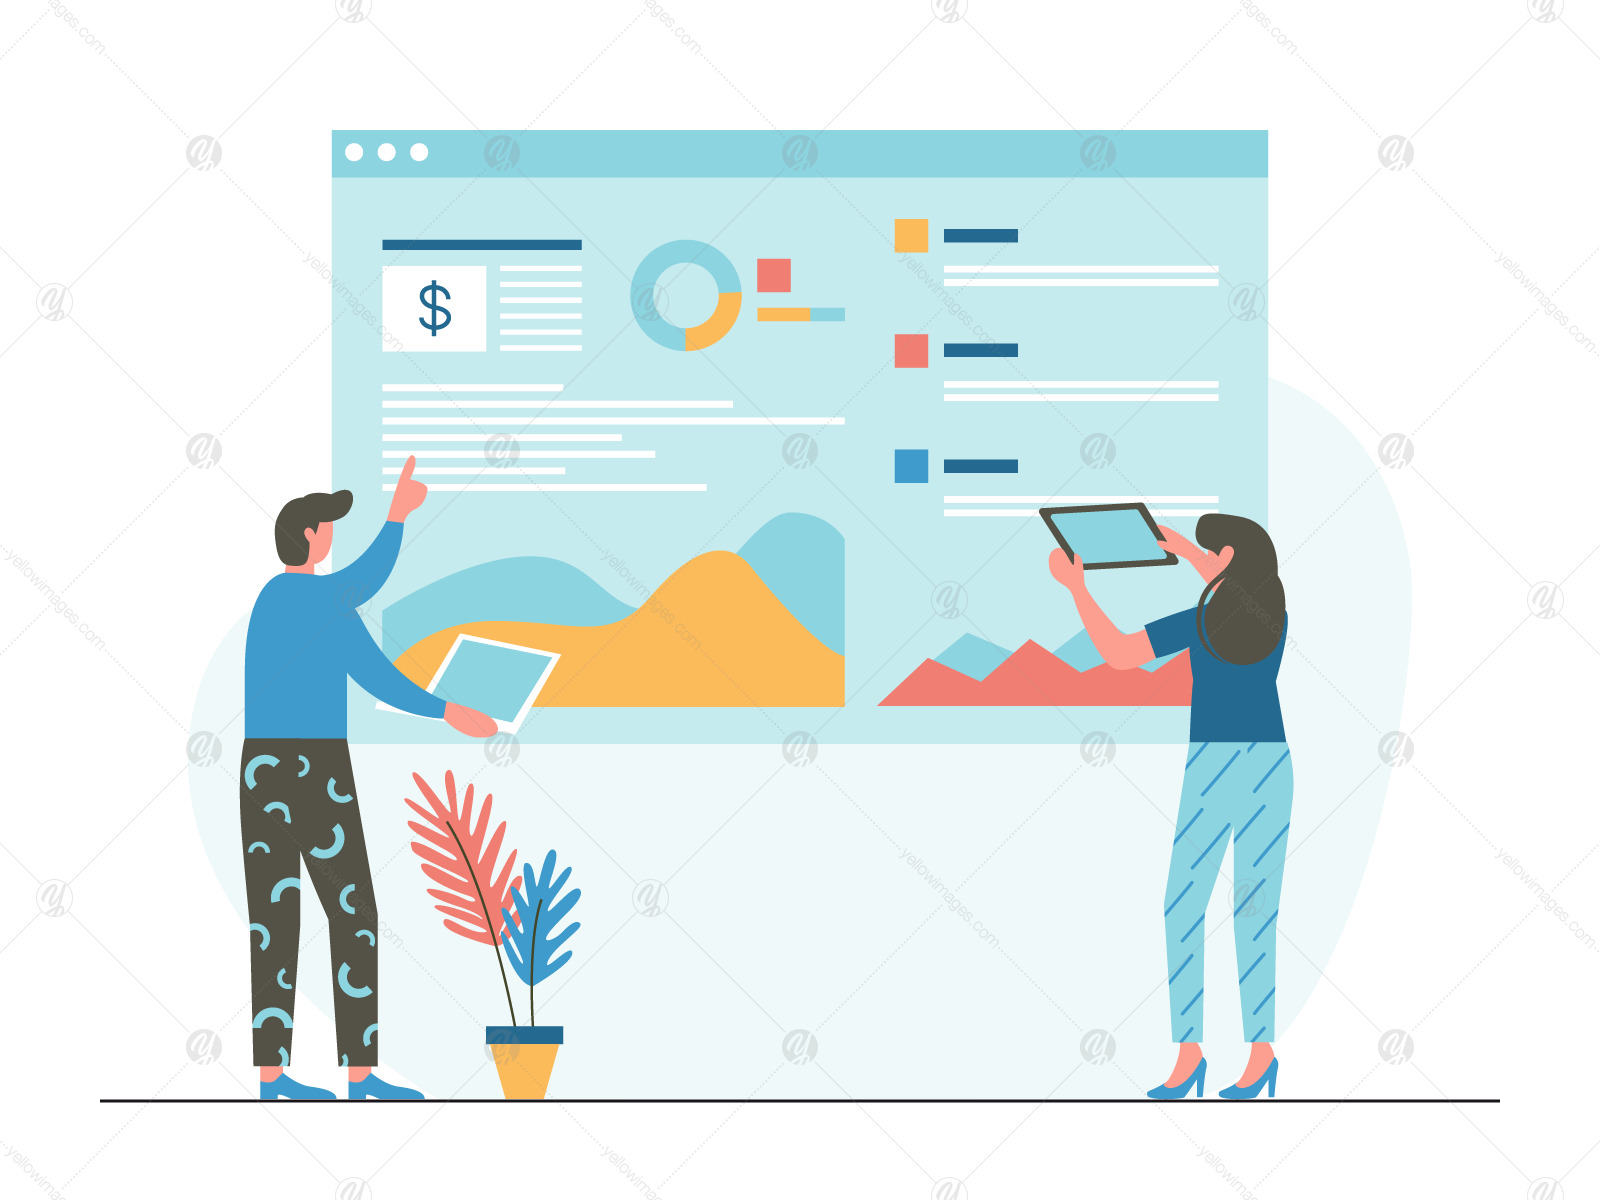 Strategy Business Illustration Vol 1